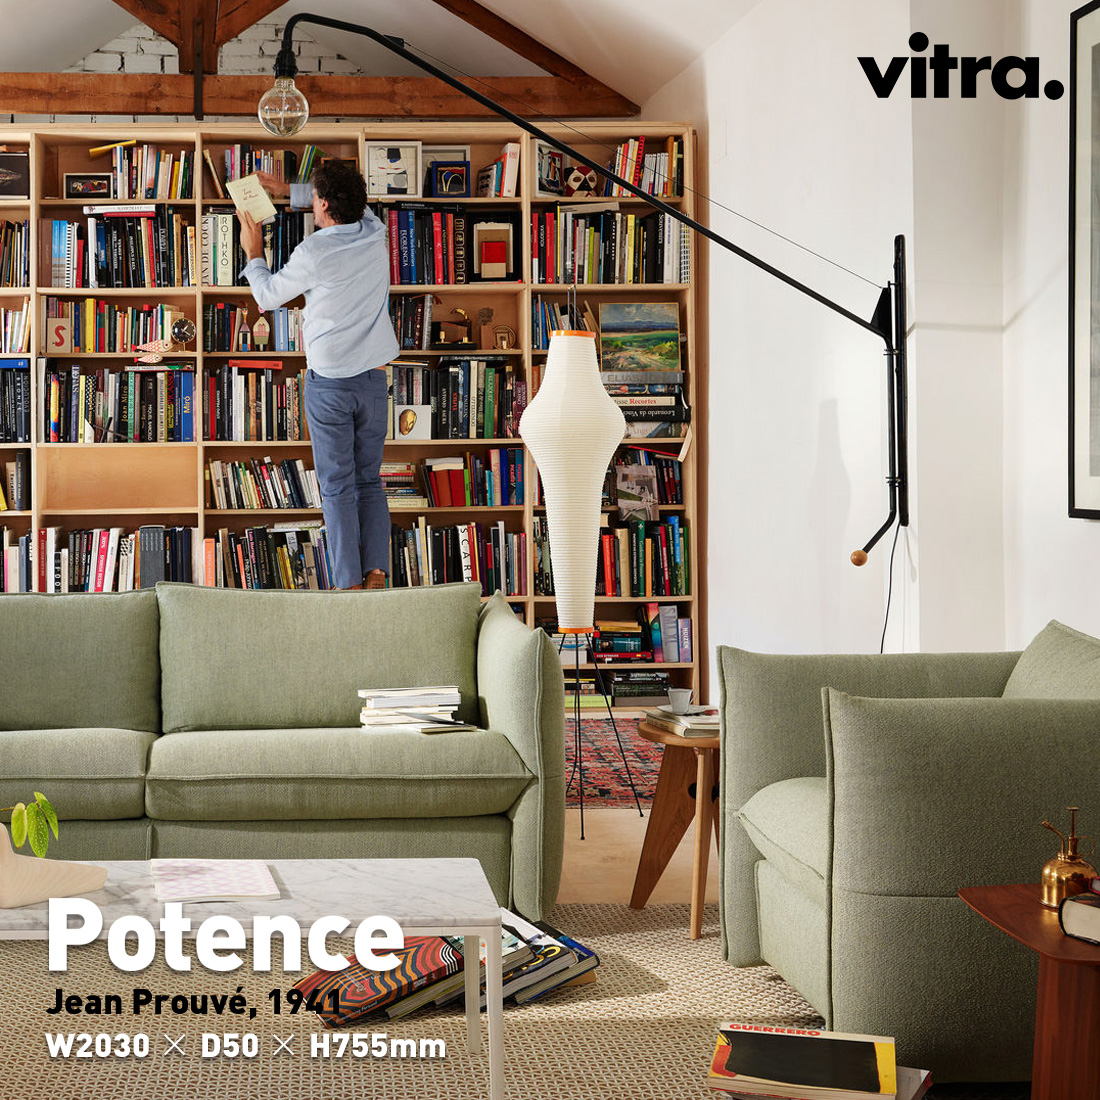 【Vitra ヴィトラ】Potence ポテンスライト リビング キッチン ダイニング ウォールランプ 壁面 照明